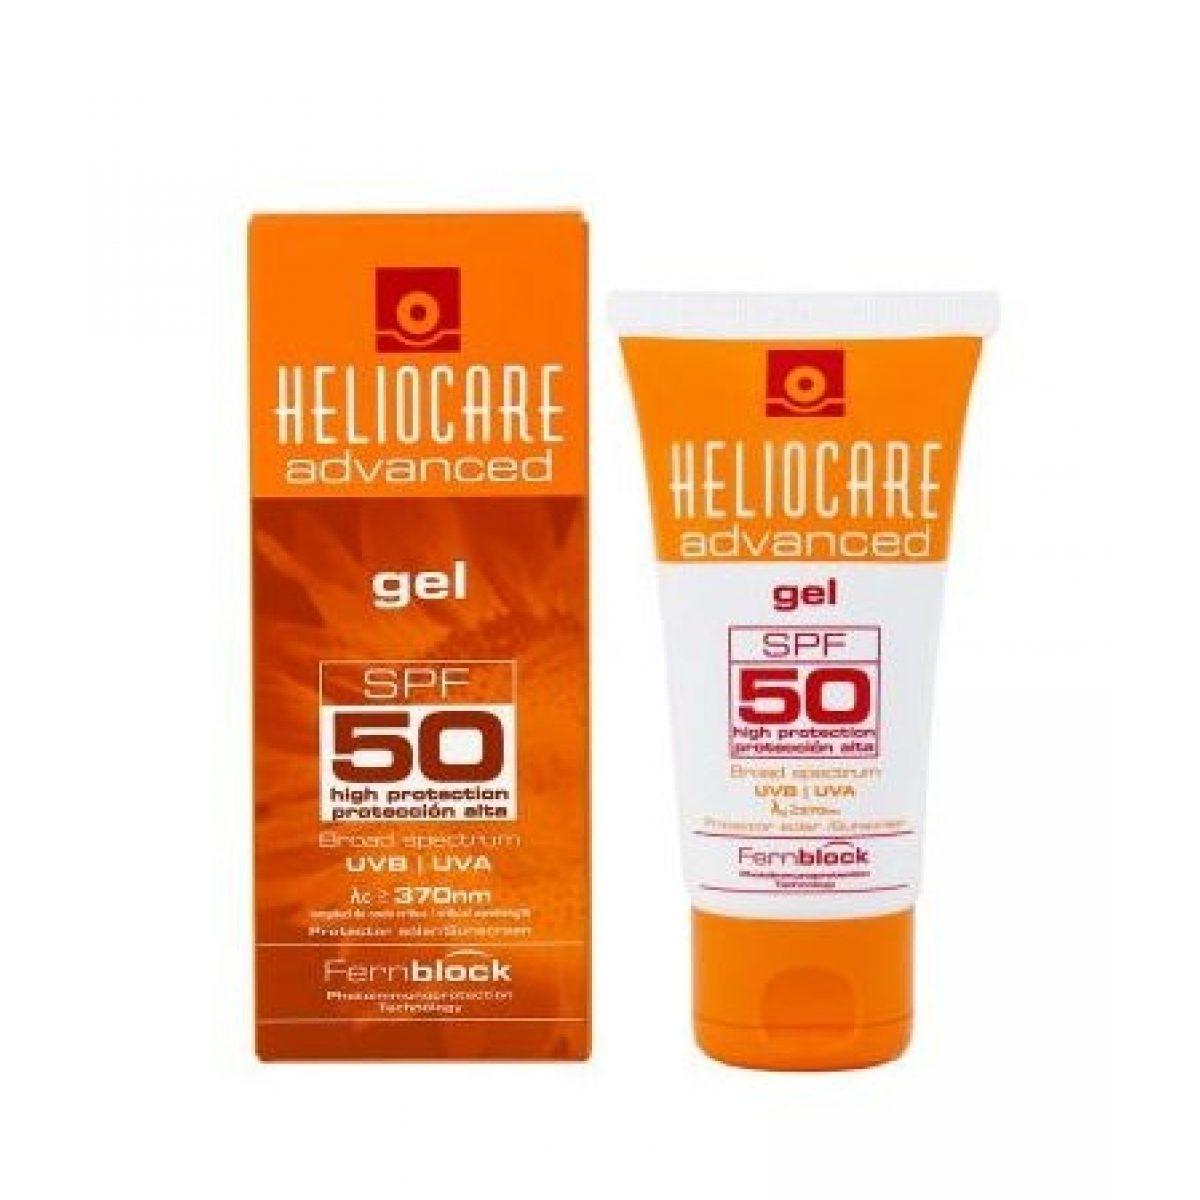 HELIOCARE ADVANCED GEL SPF50